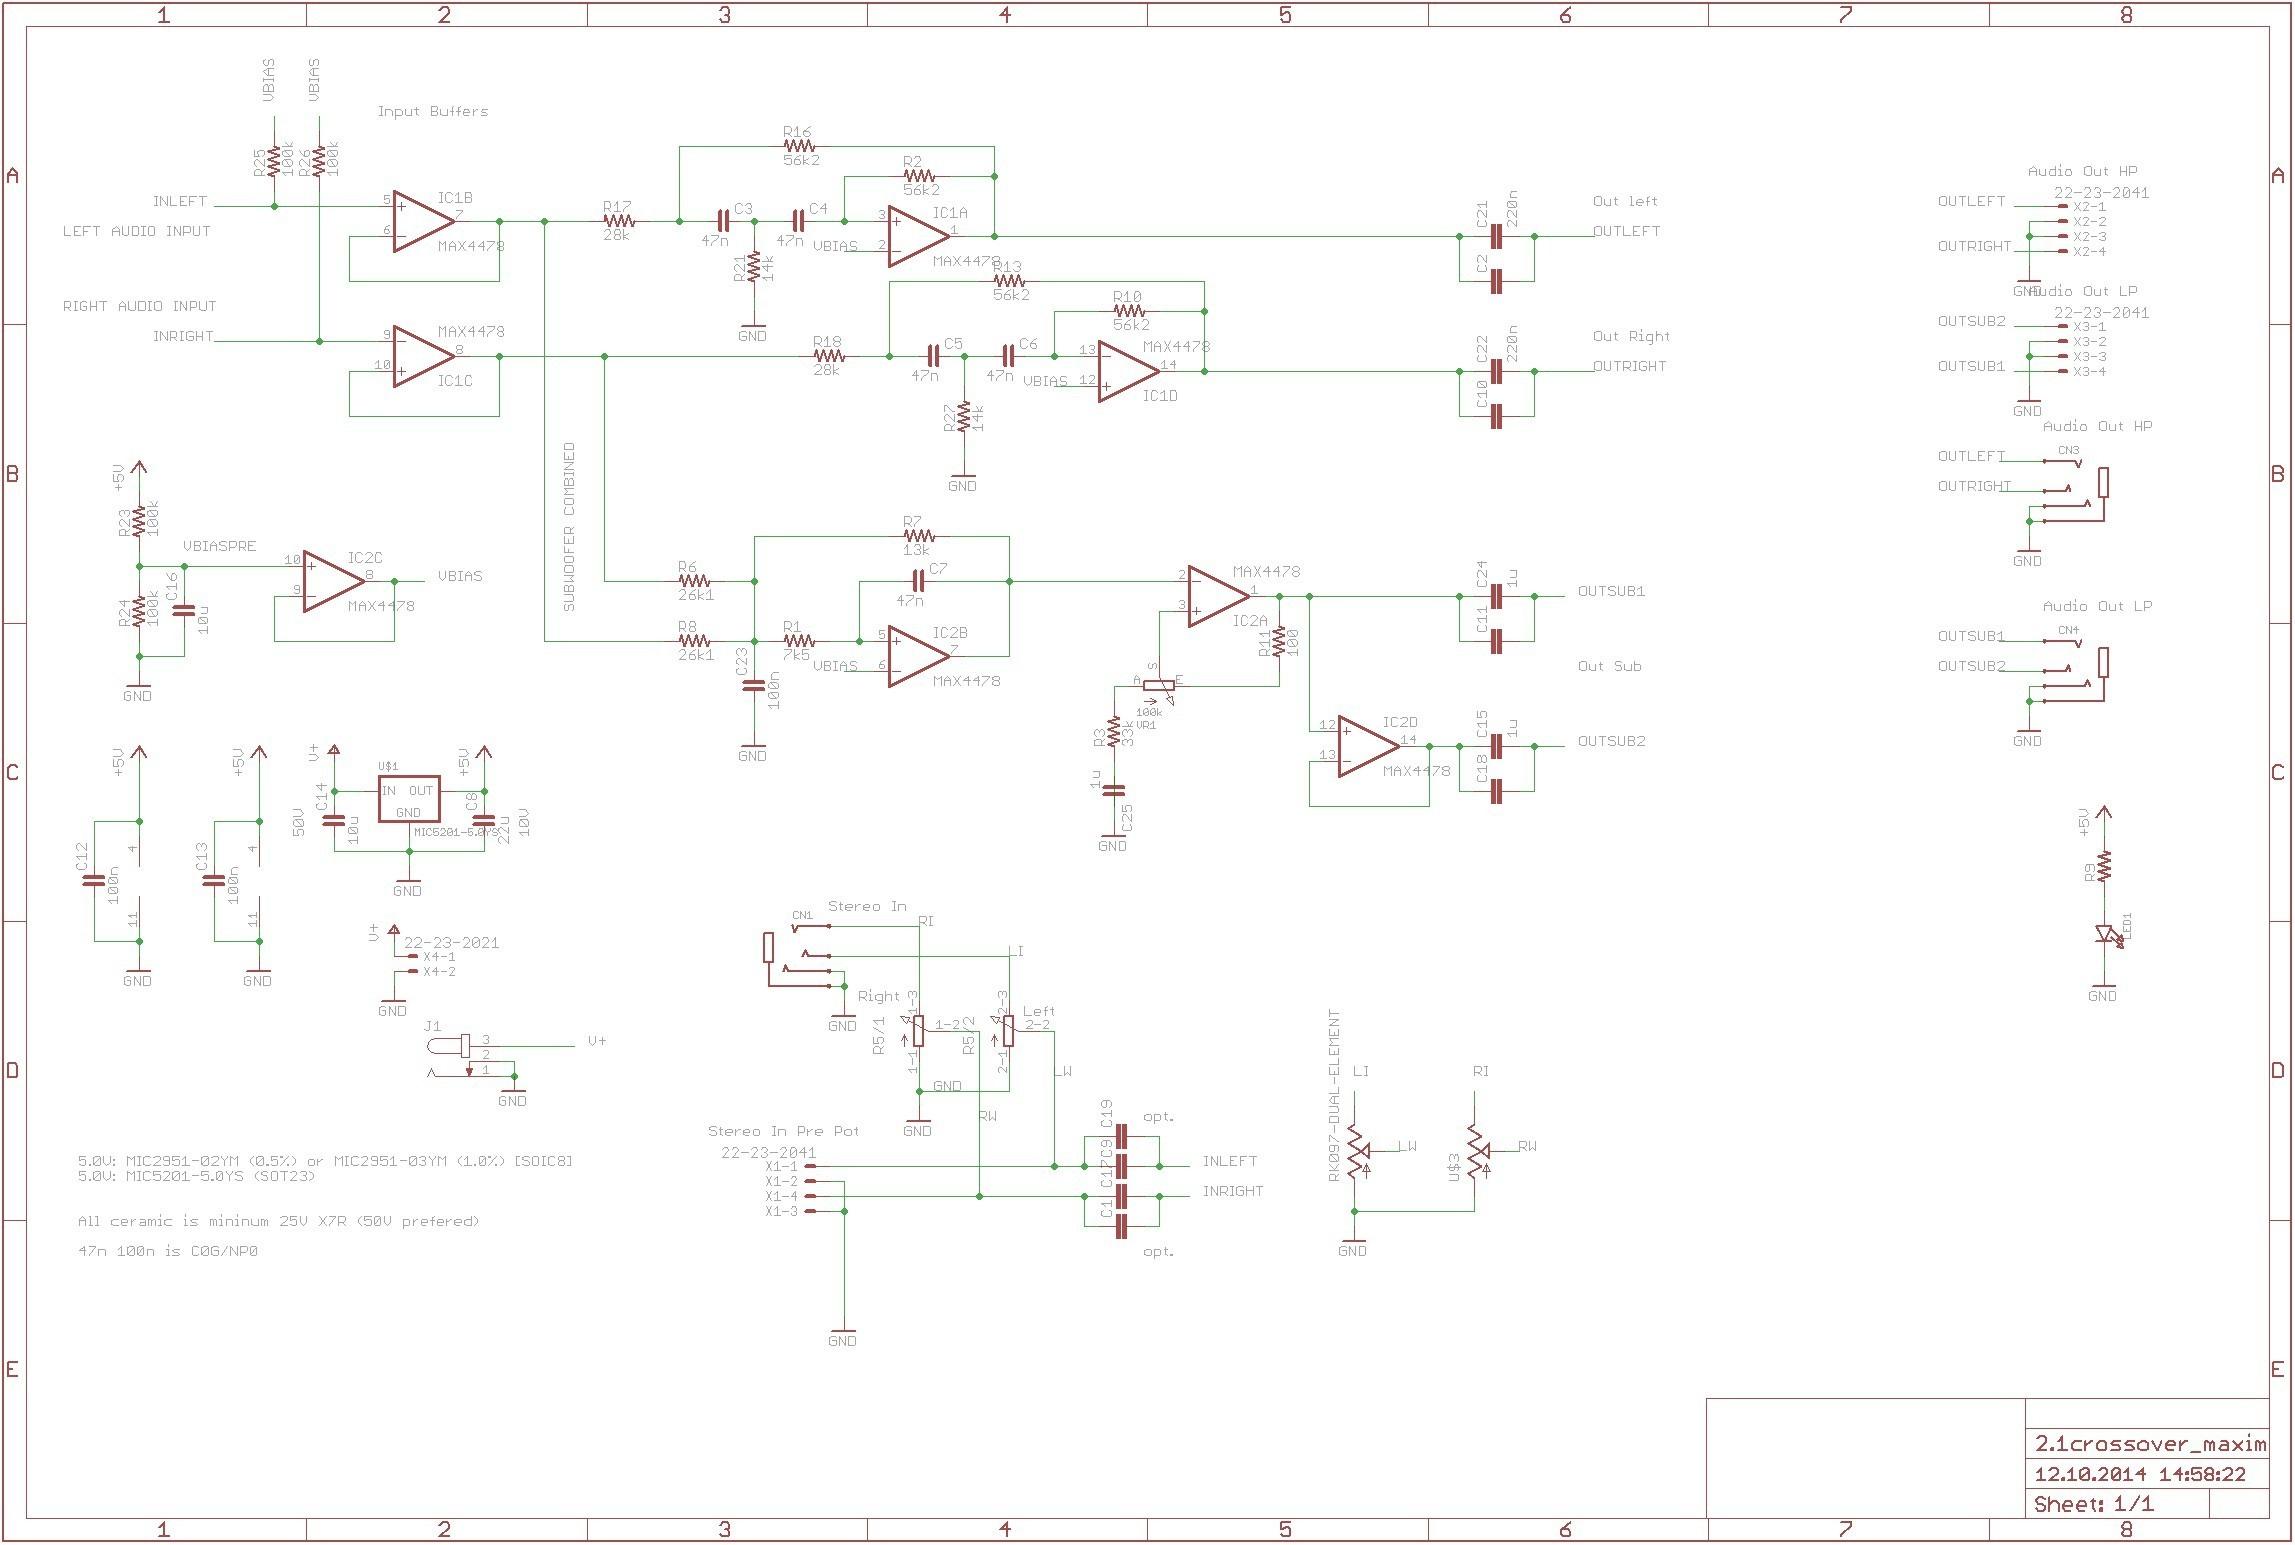 Wiring Diagram for House Lighting Circuit House Wiring Diagram Of Wiring Diagram for House Lighting Circuit